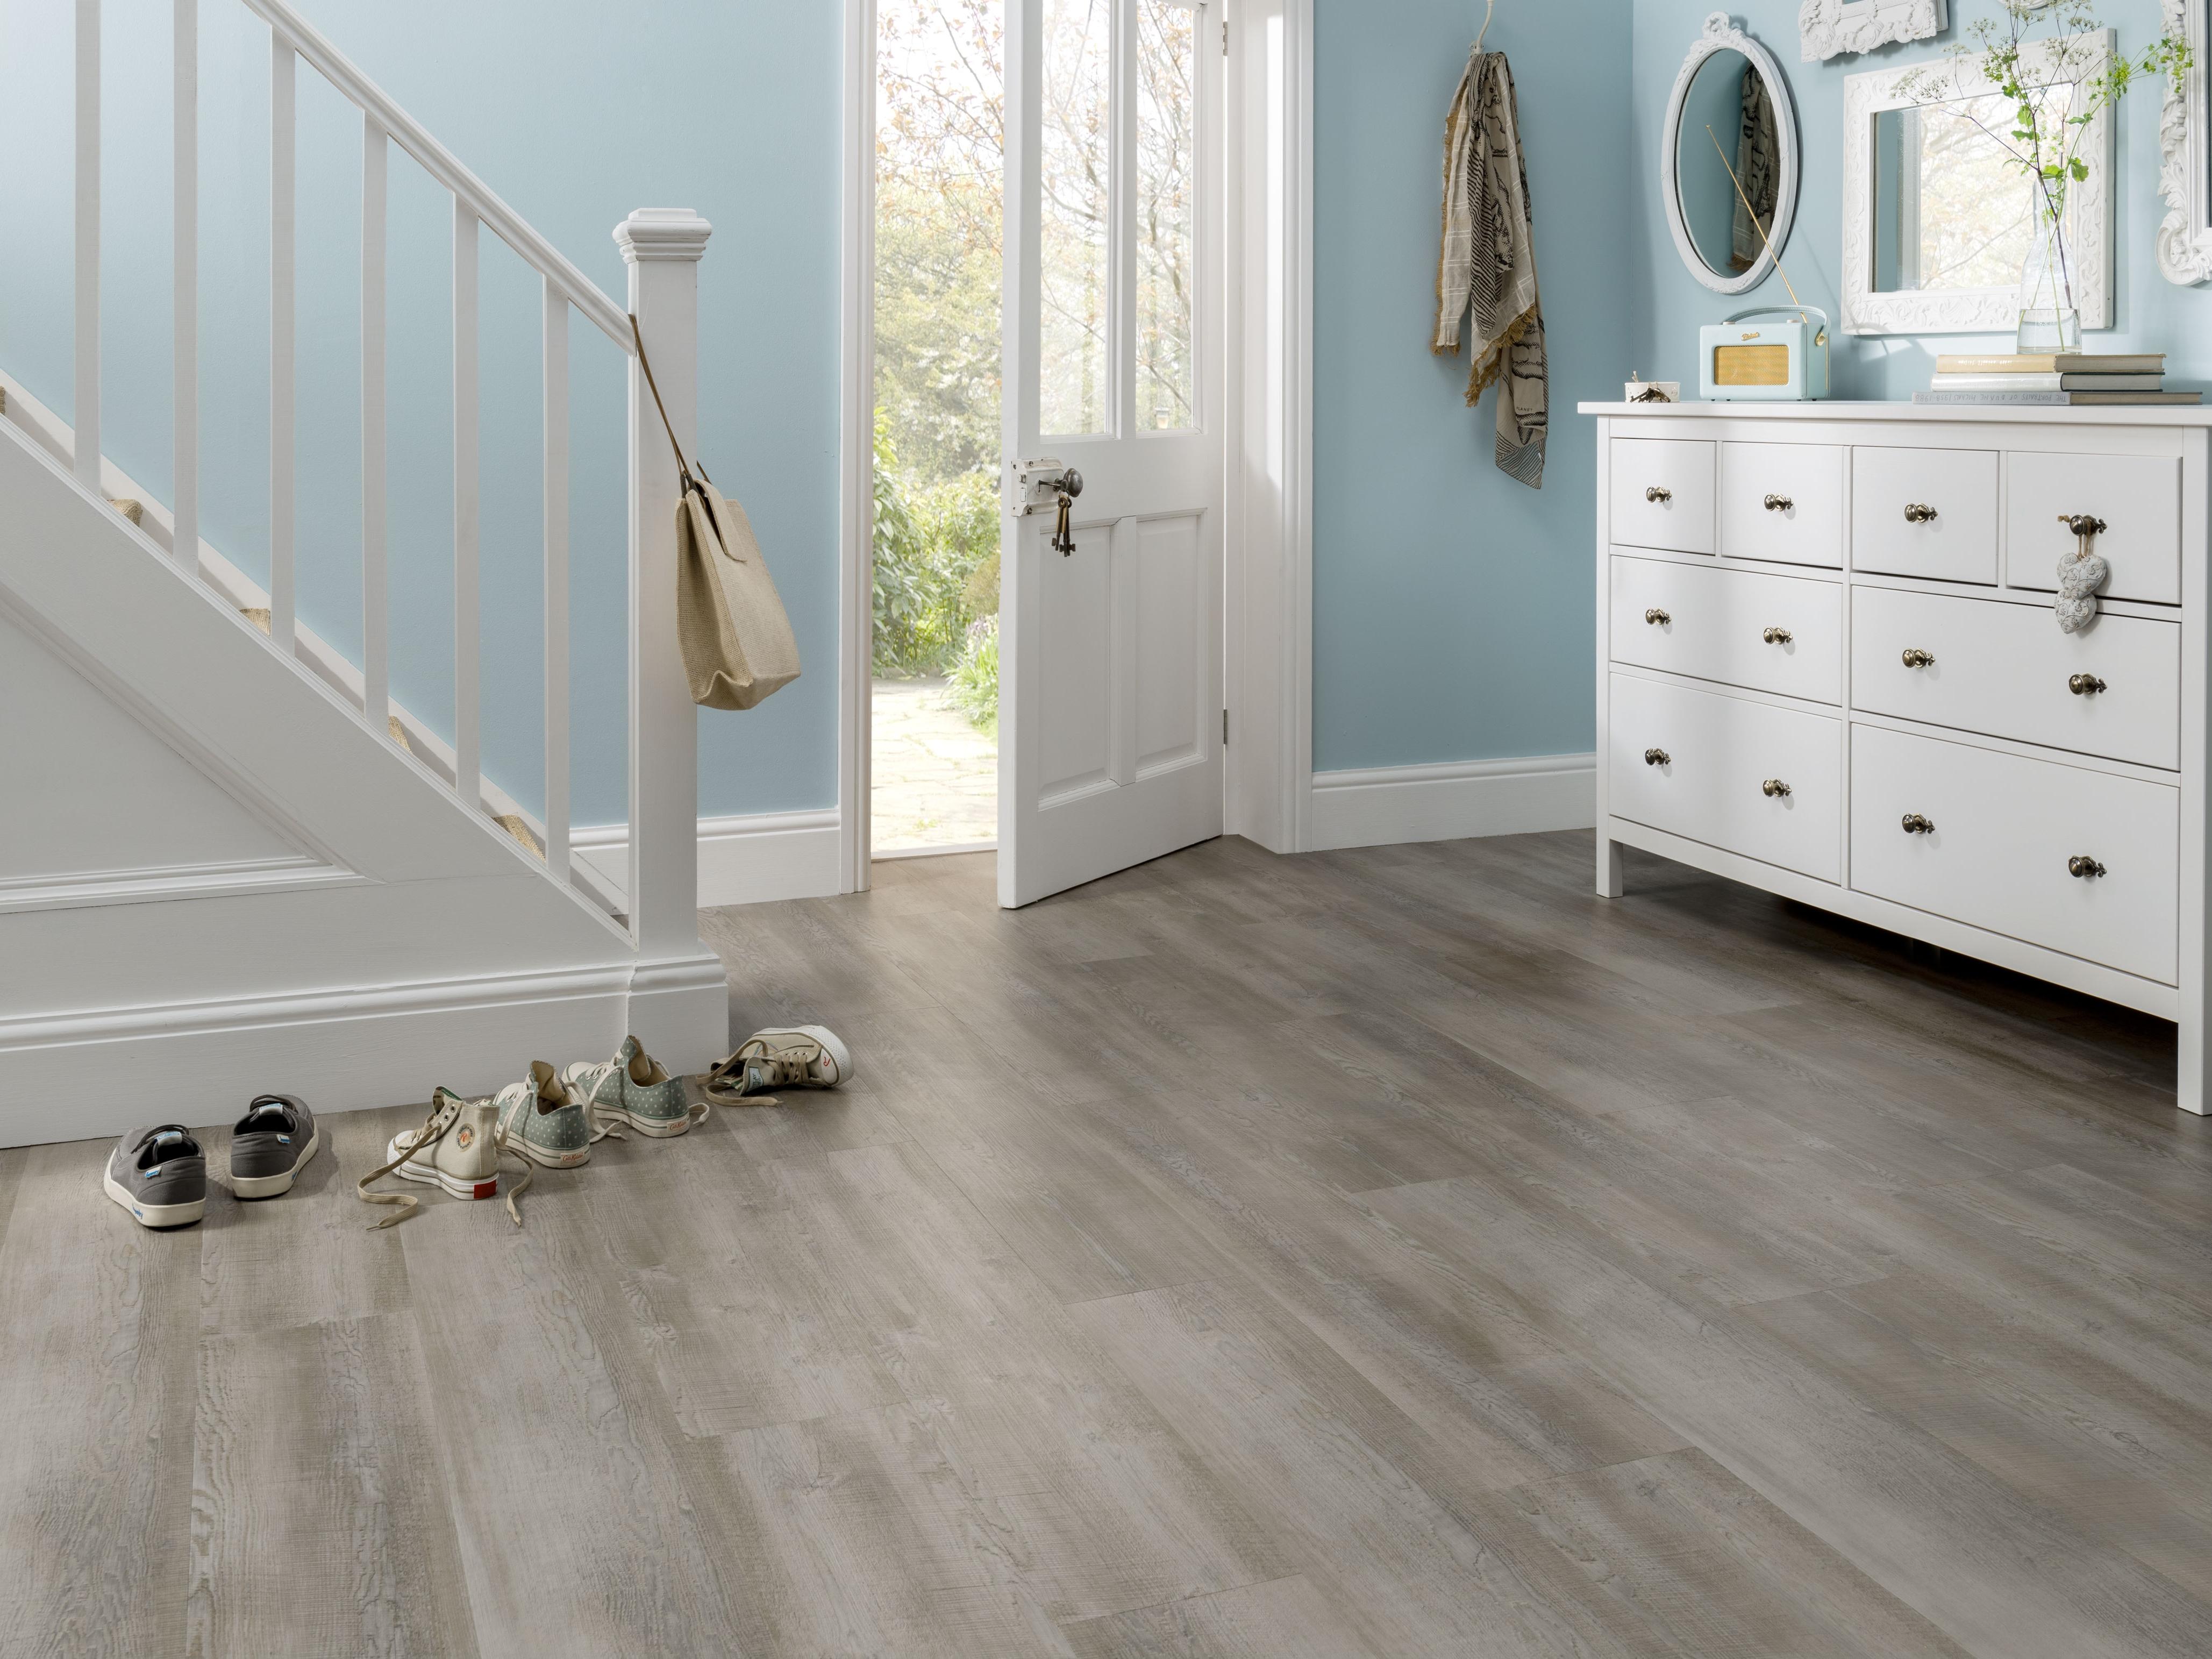 Fullsize Of Gray Laminate Flooring